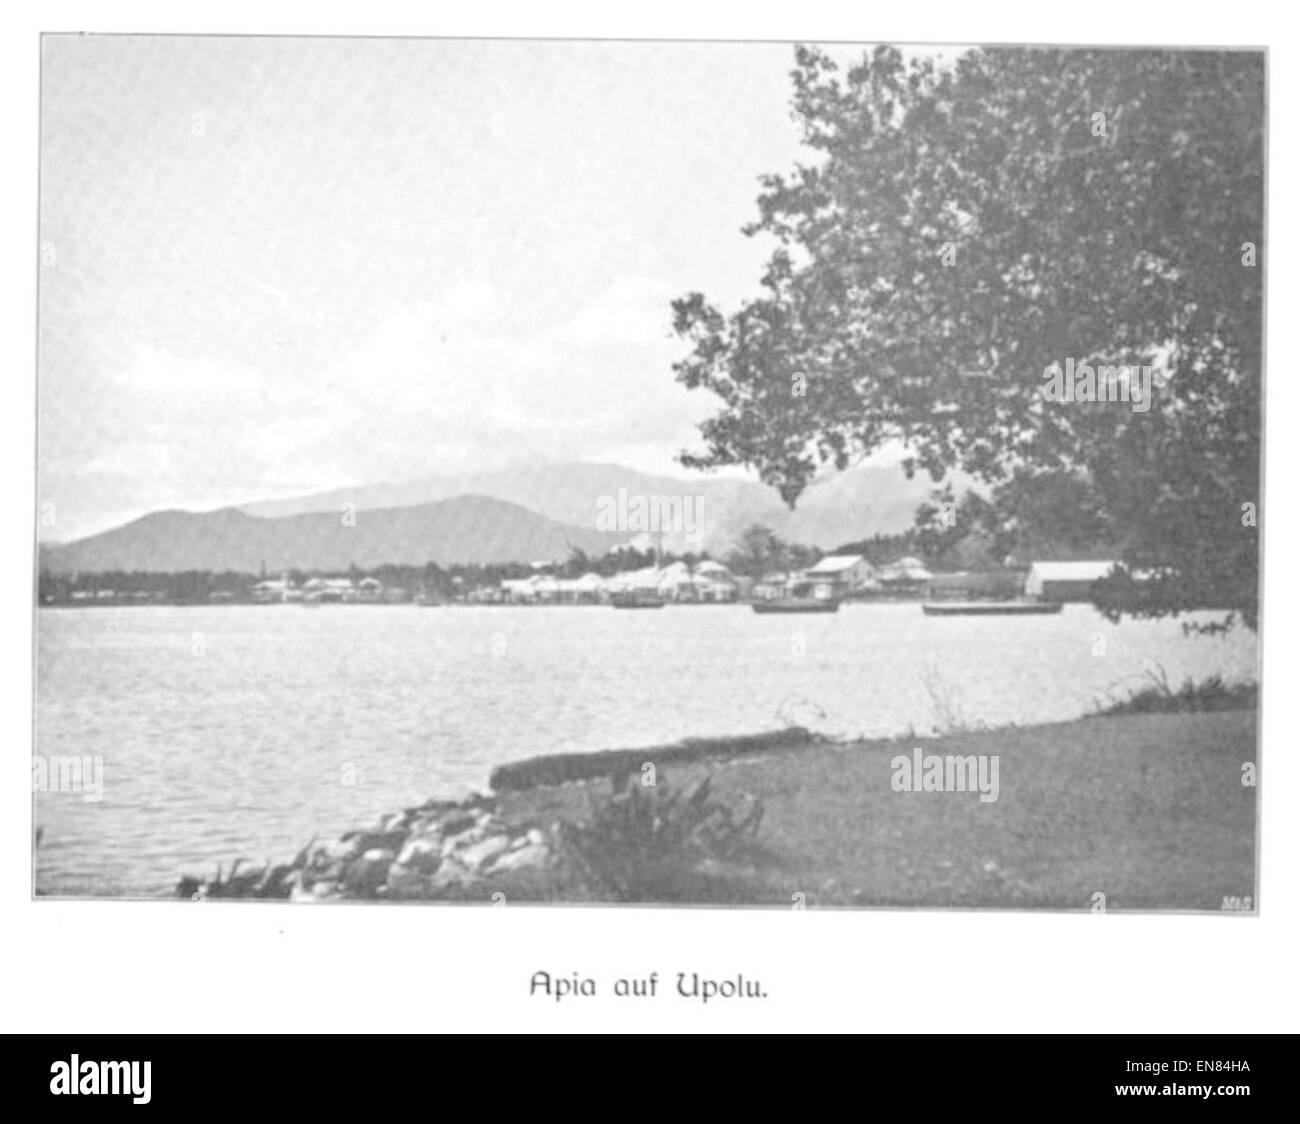 WOHLTMANN(1904) p096 Samoa, Blick auf Apia, Hauptort der Insel Upolu - Stock Image